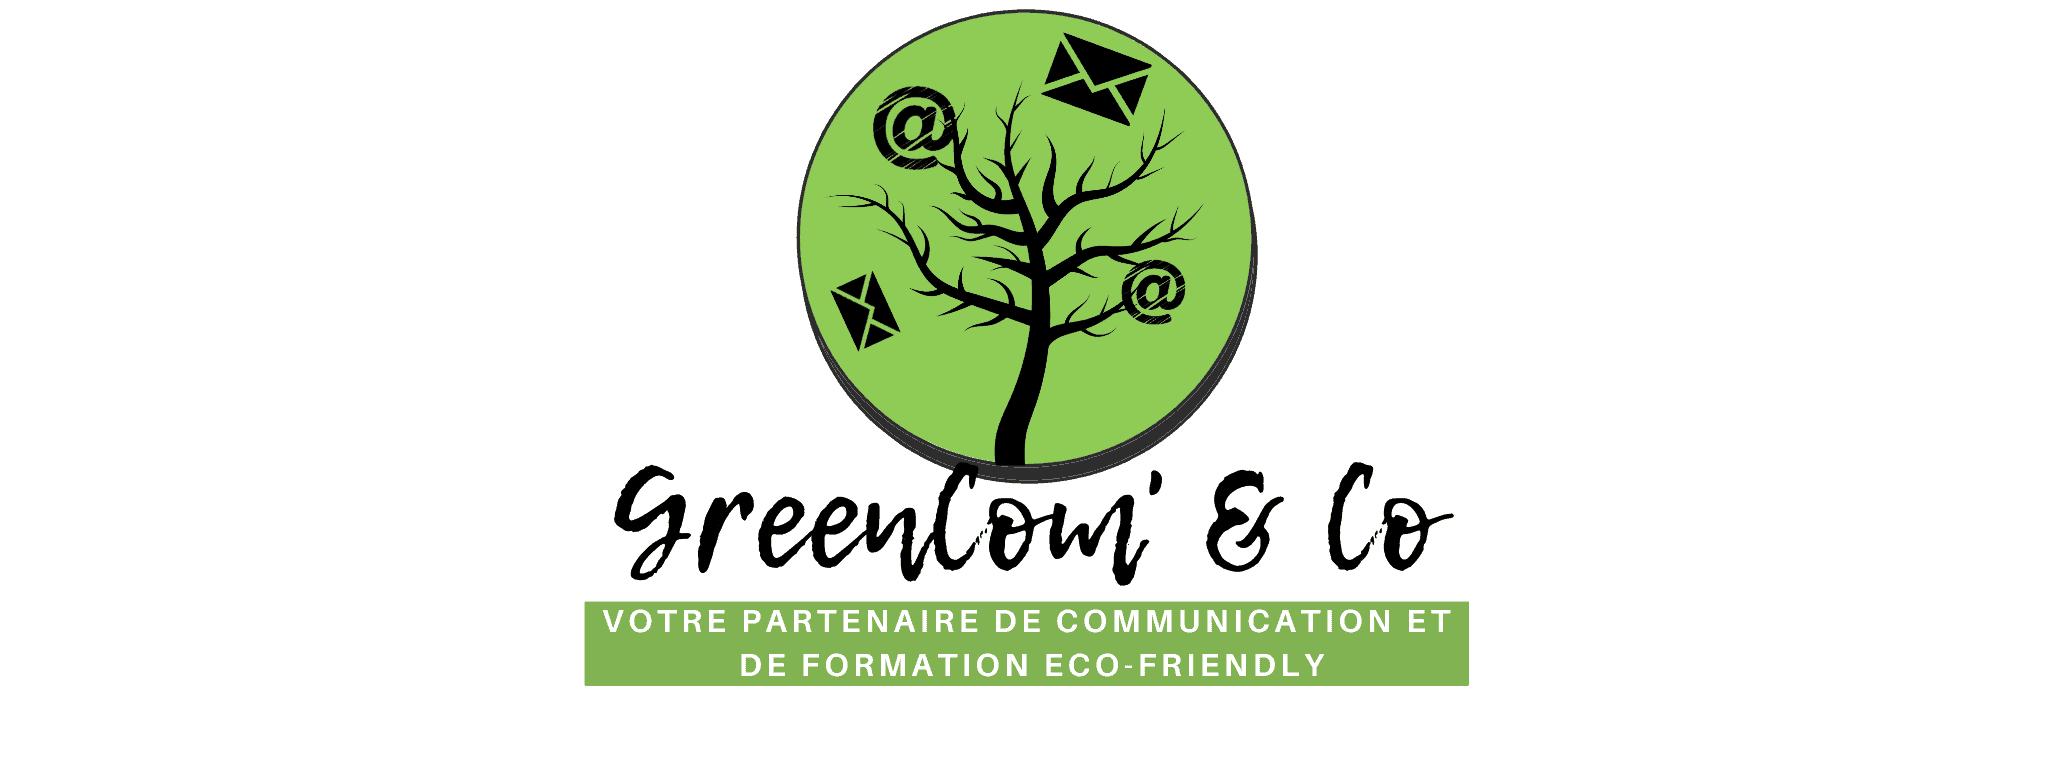 GreenCom' and Co